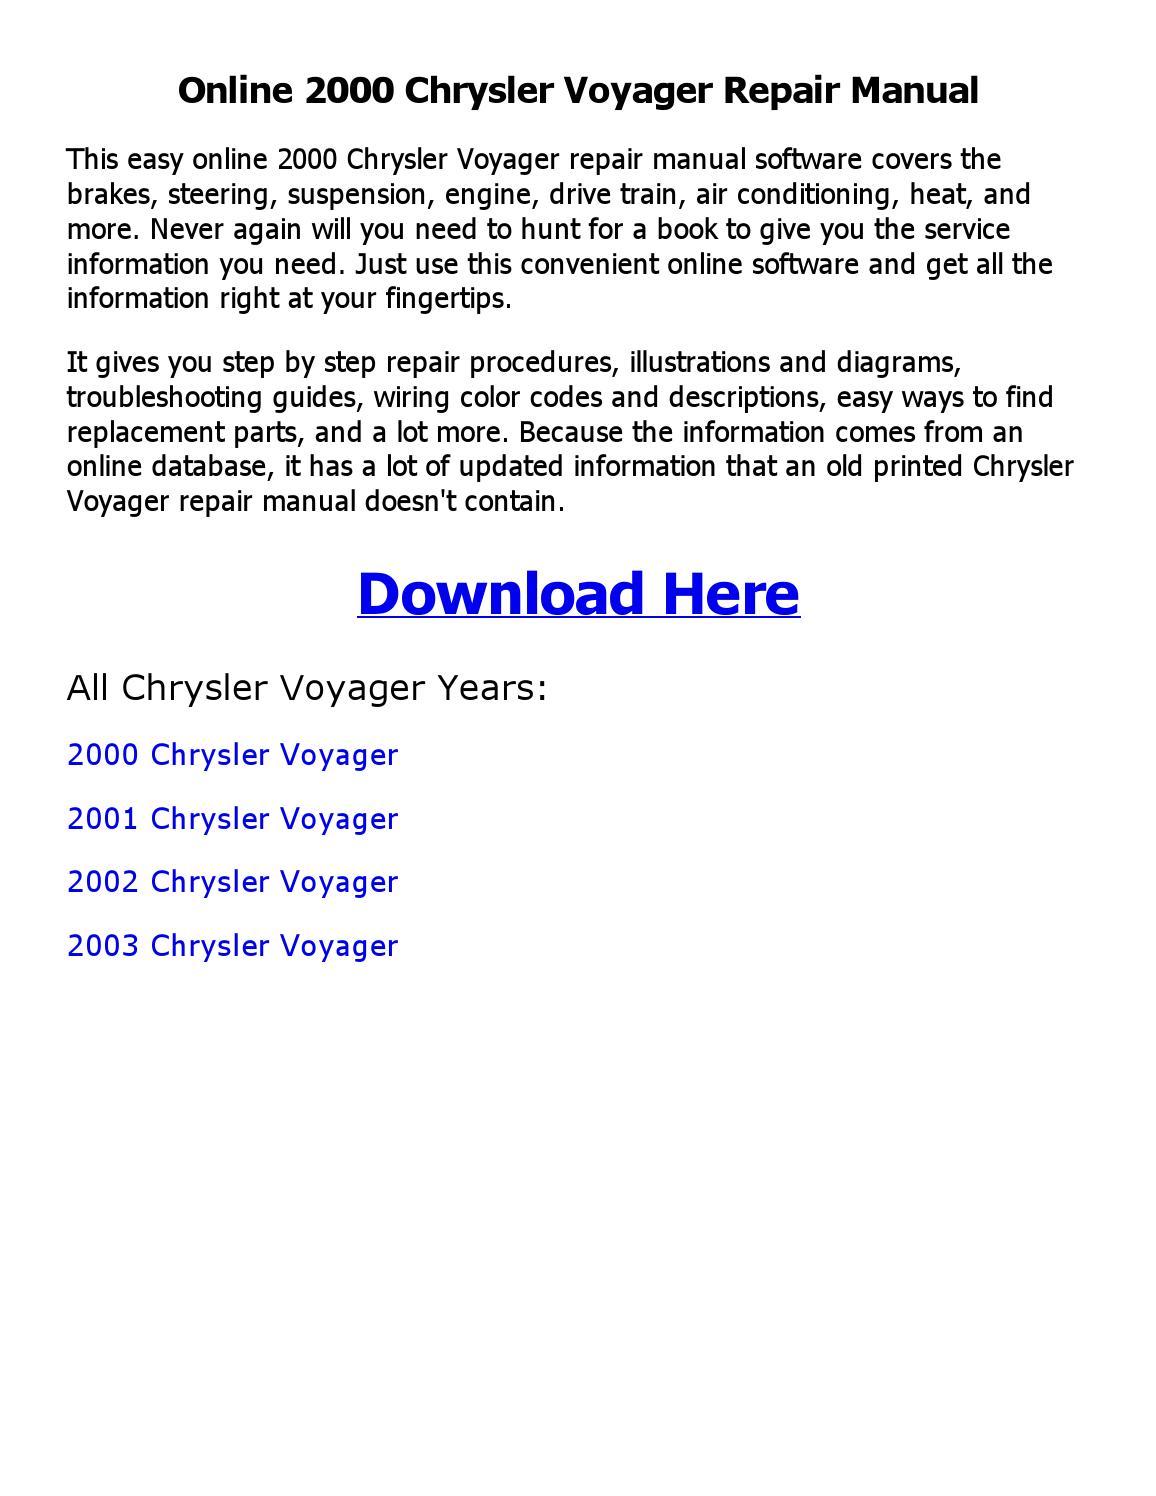 2000 Chrysler Voyager Repair Manual Online By Sajibahamed Issuu Wiring Diagrams Download